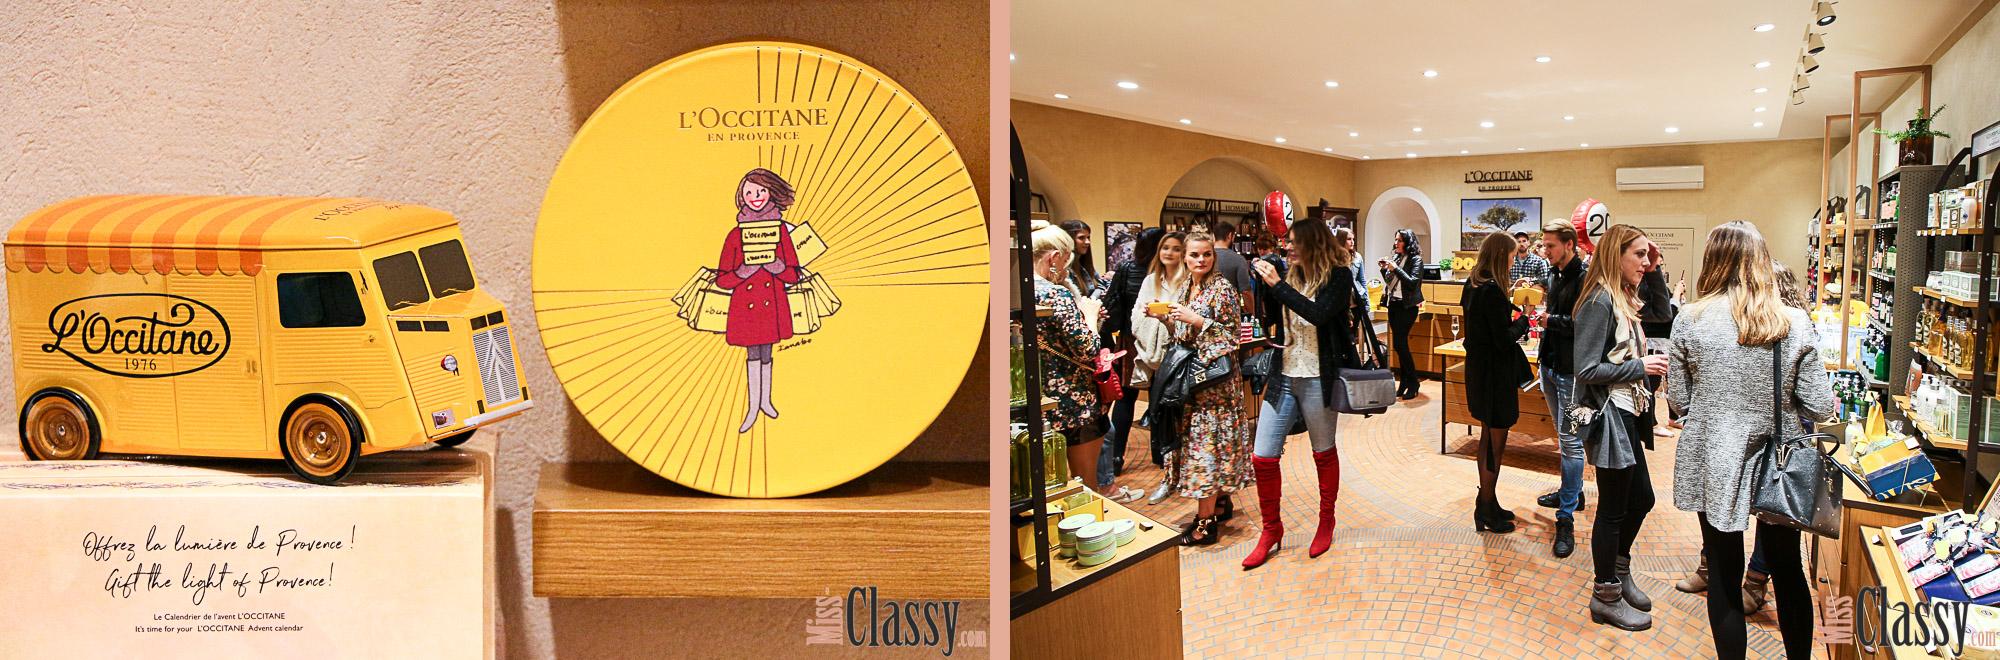 LIFESTYLE: L'Occitane en Provence feiert den 20. Geburtstag in Graz, Miss Classy, Lifestyle Blog, Beauty Blog, Graz, Steiermark, Österreich, classy, beclassy, Provence, Kosmetik, Parfum, Gesichtspflege, Store, Shop, Lavendel, Bloggerevent